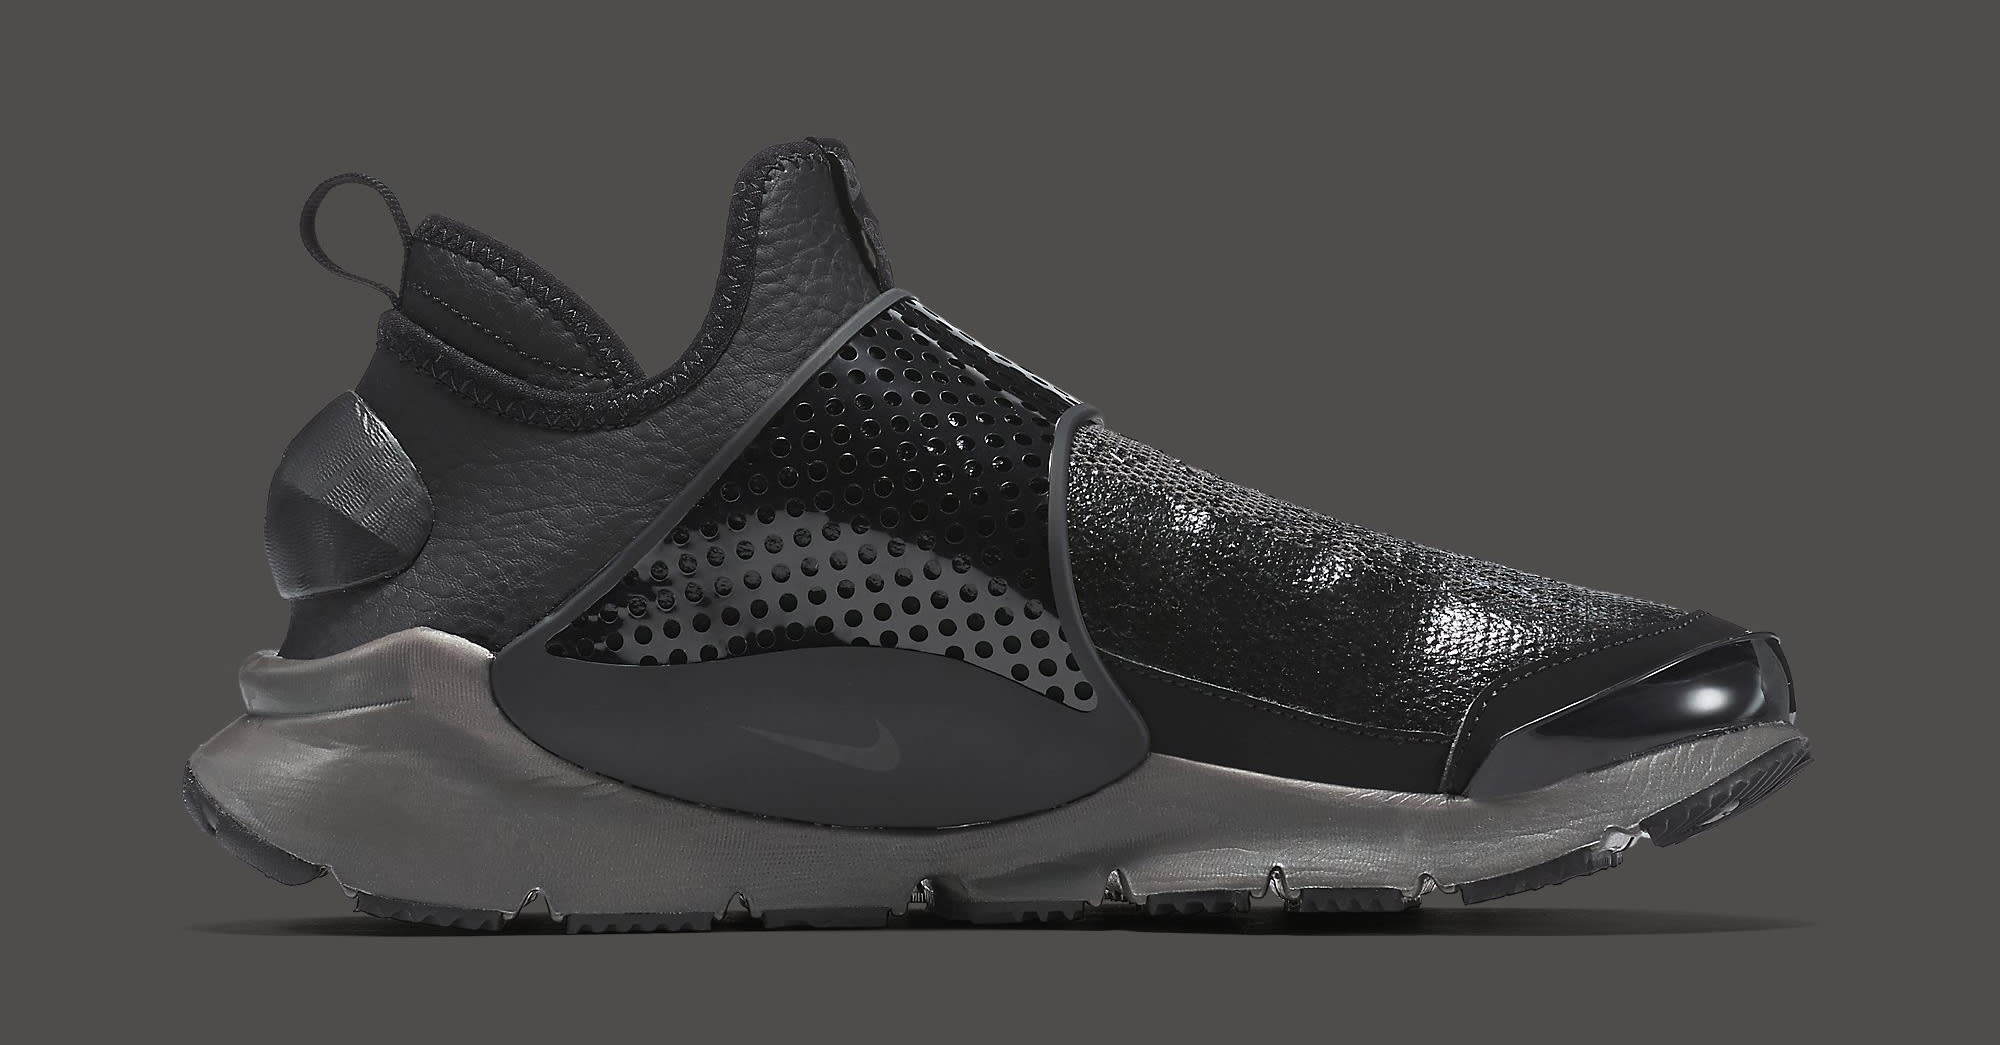 Stone Island Nike Sock Dart 910090-001 Medial